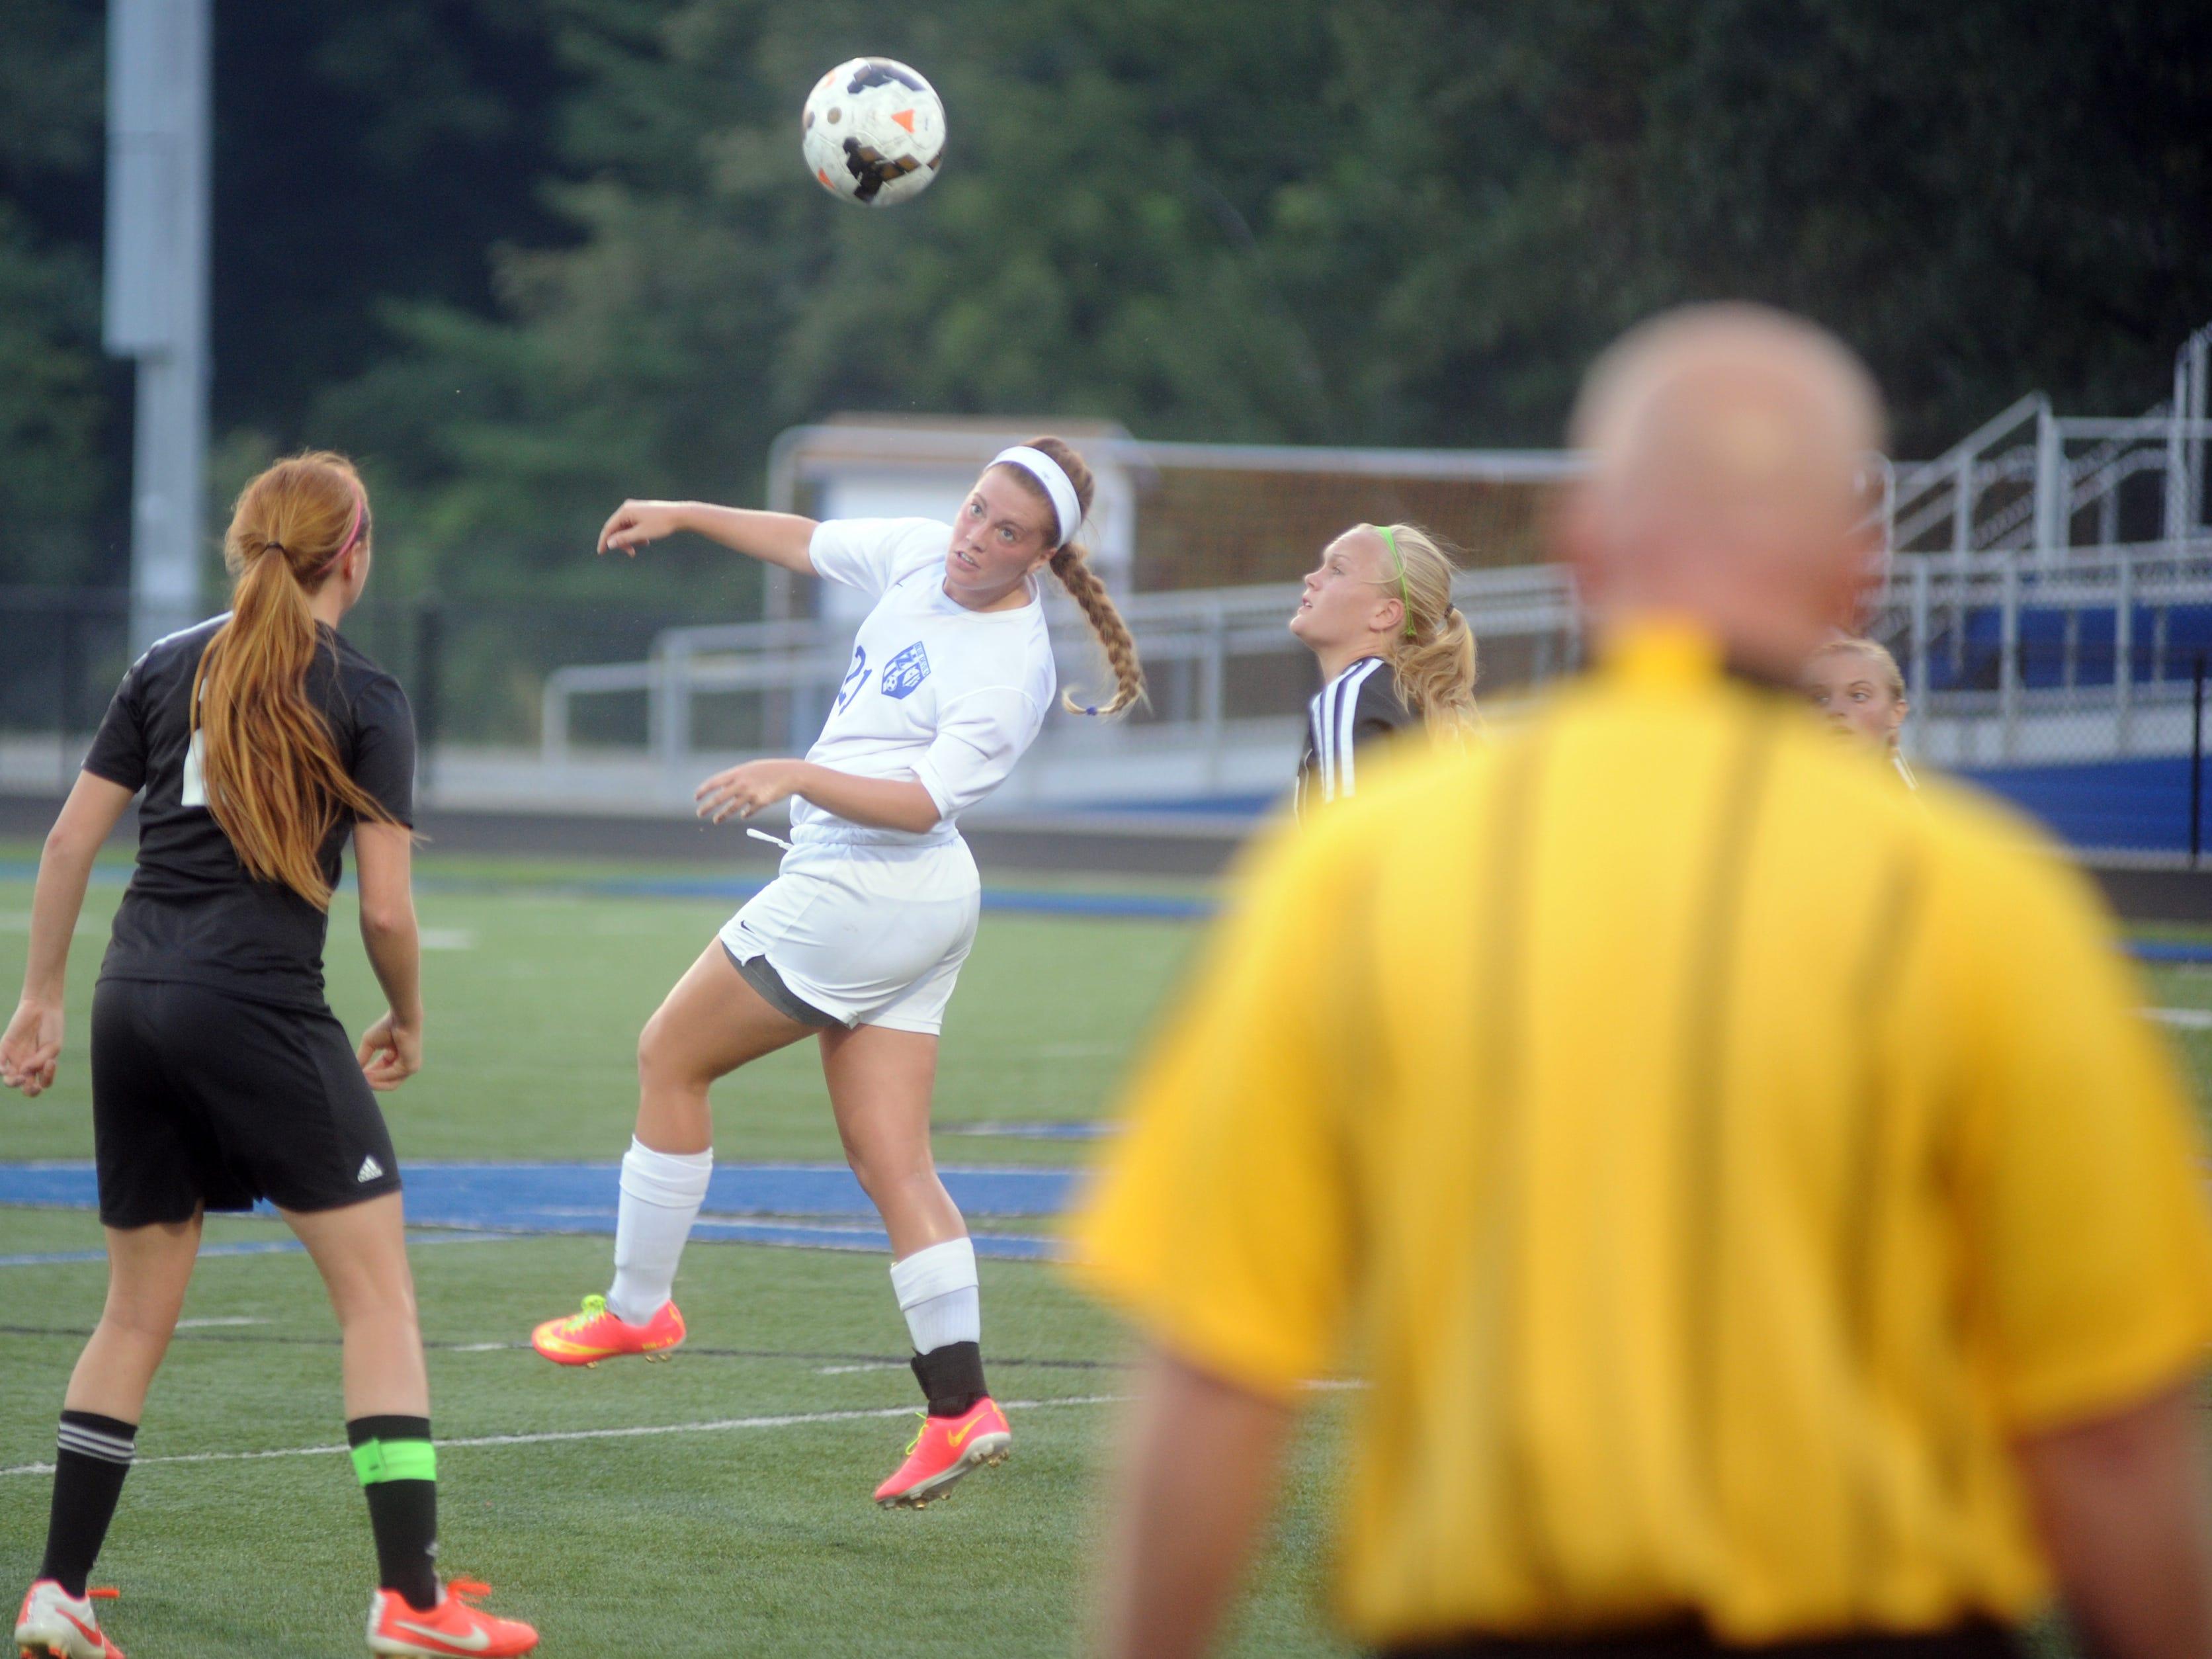 Kylie Mercer of Zanesville heads the ball.